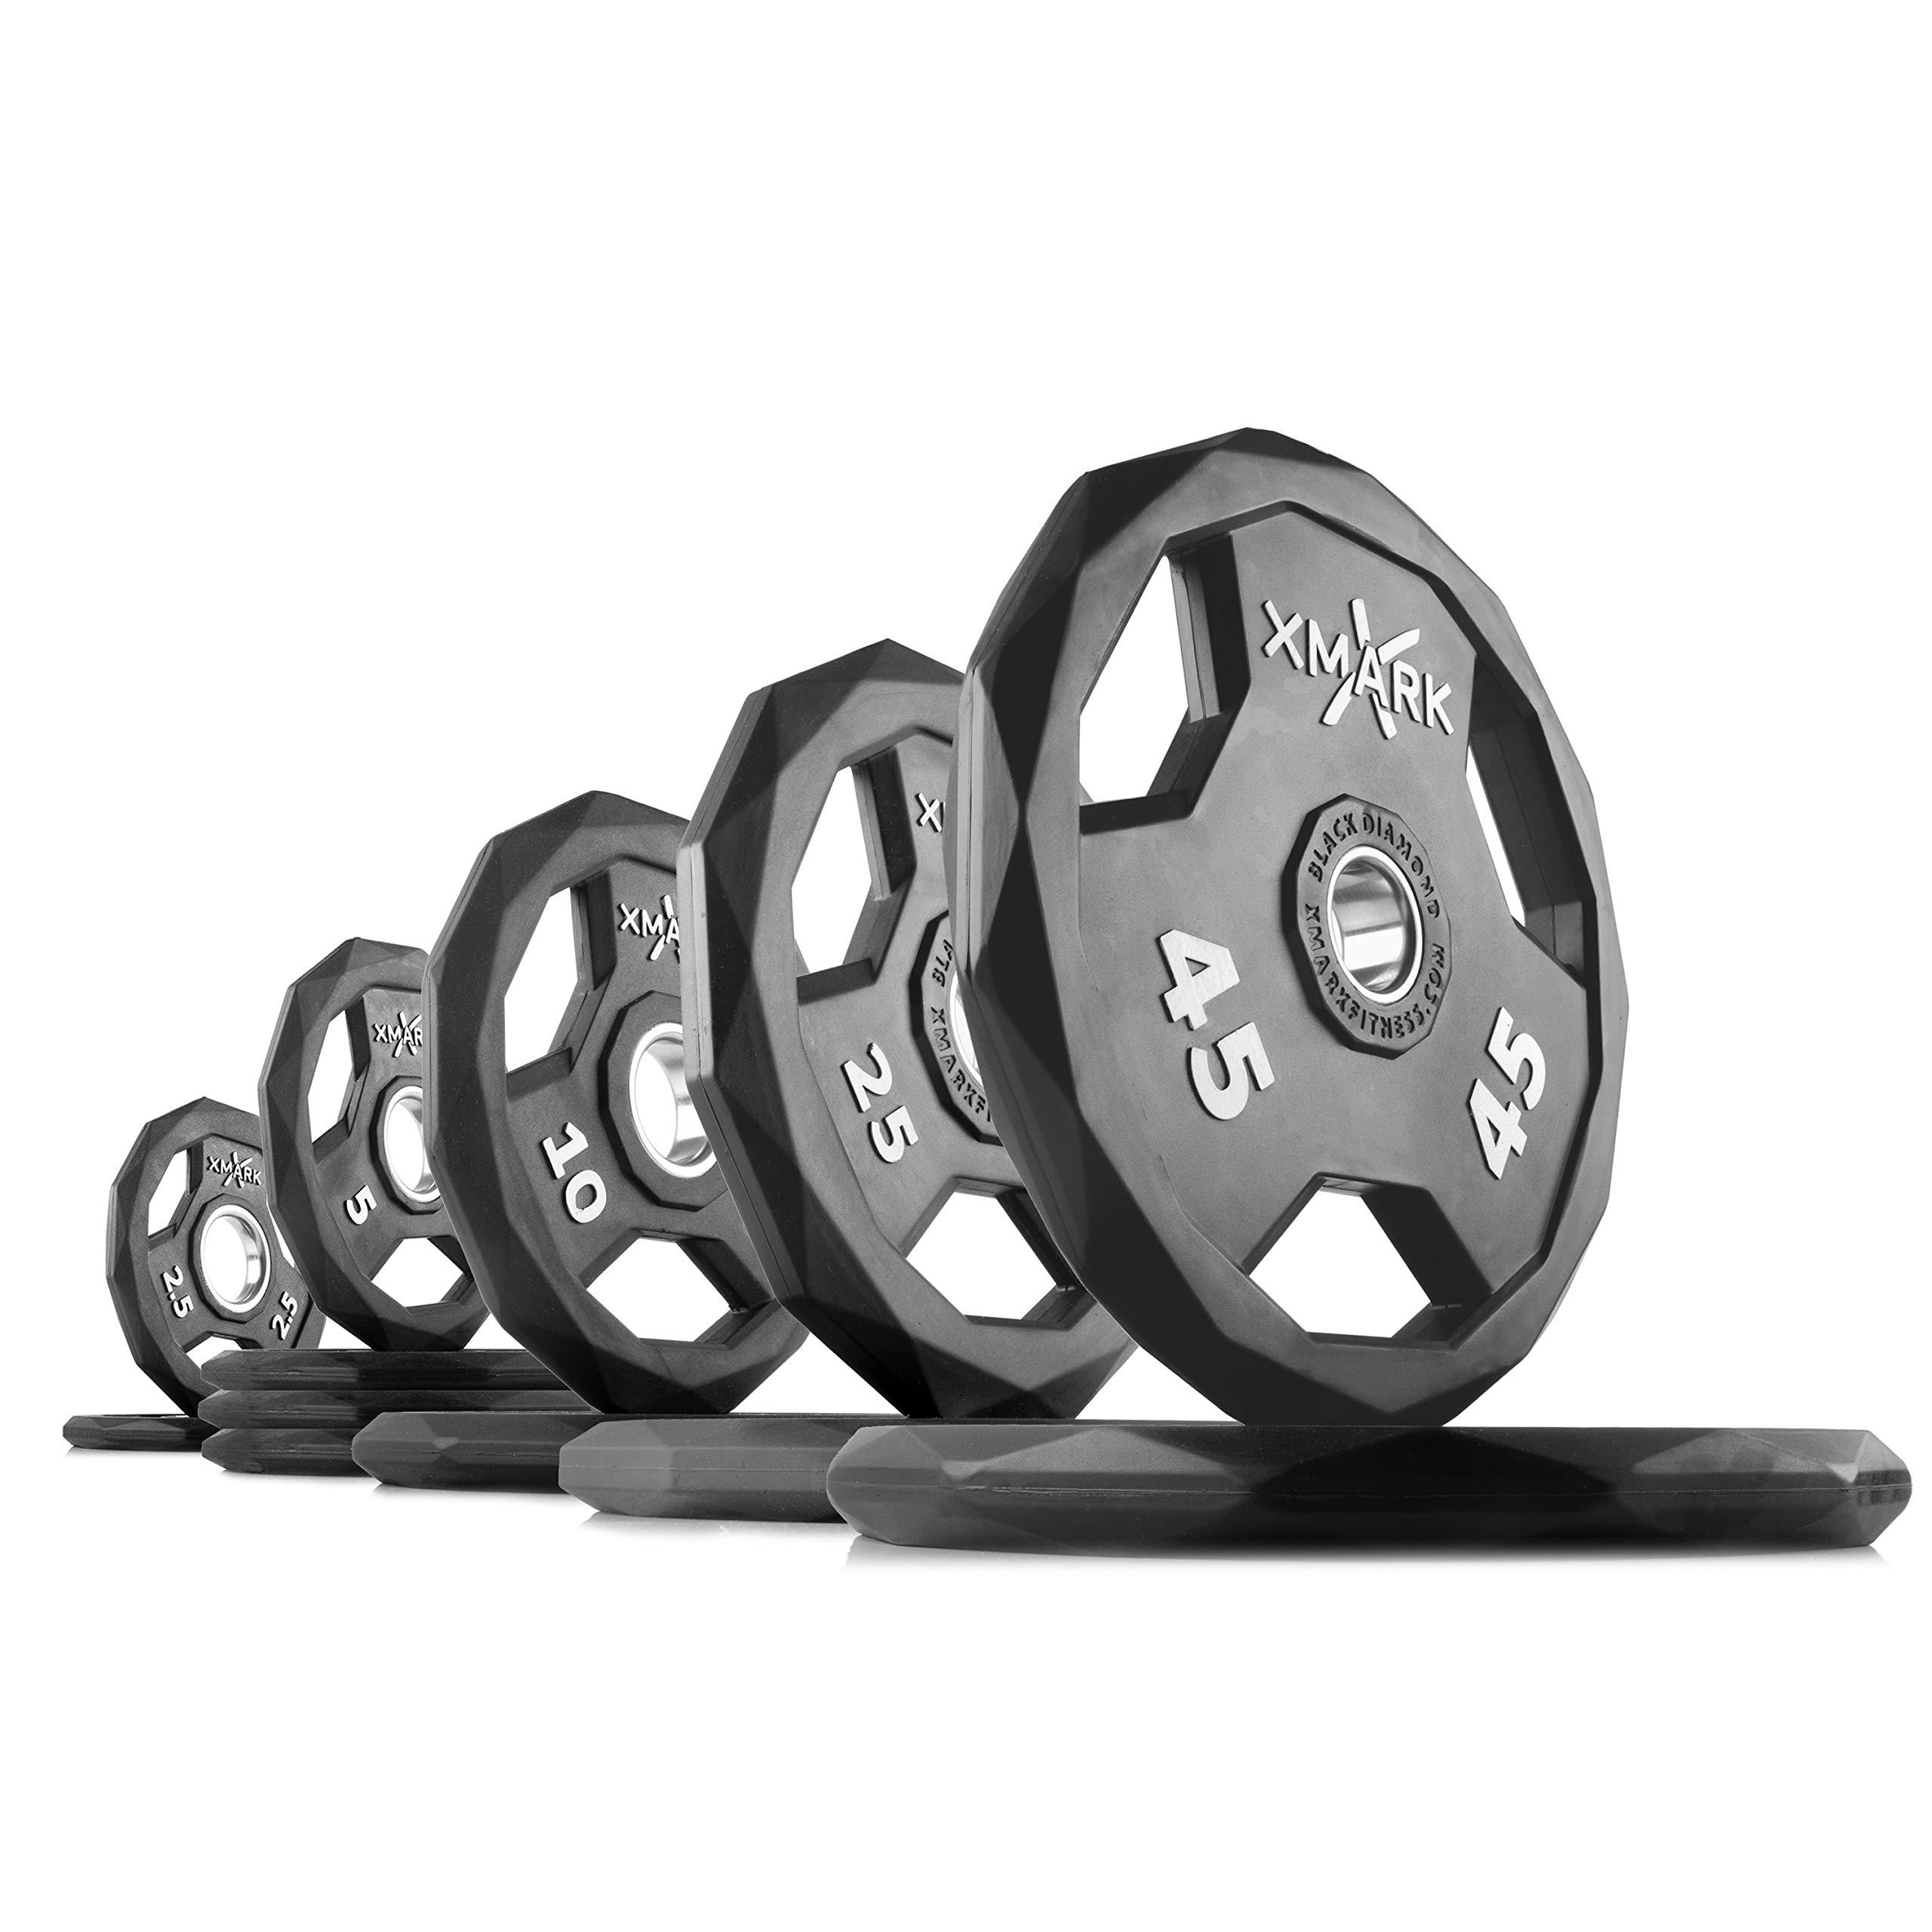 XMark Black Diamond 185 lb Set (Option 1) Olympic Weight Plates, One-Year Warranty, Patented Design